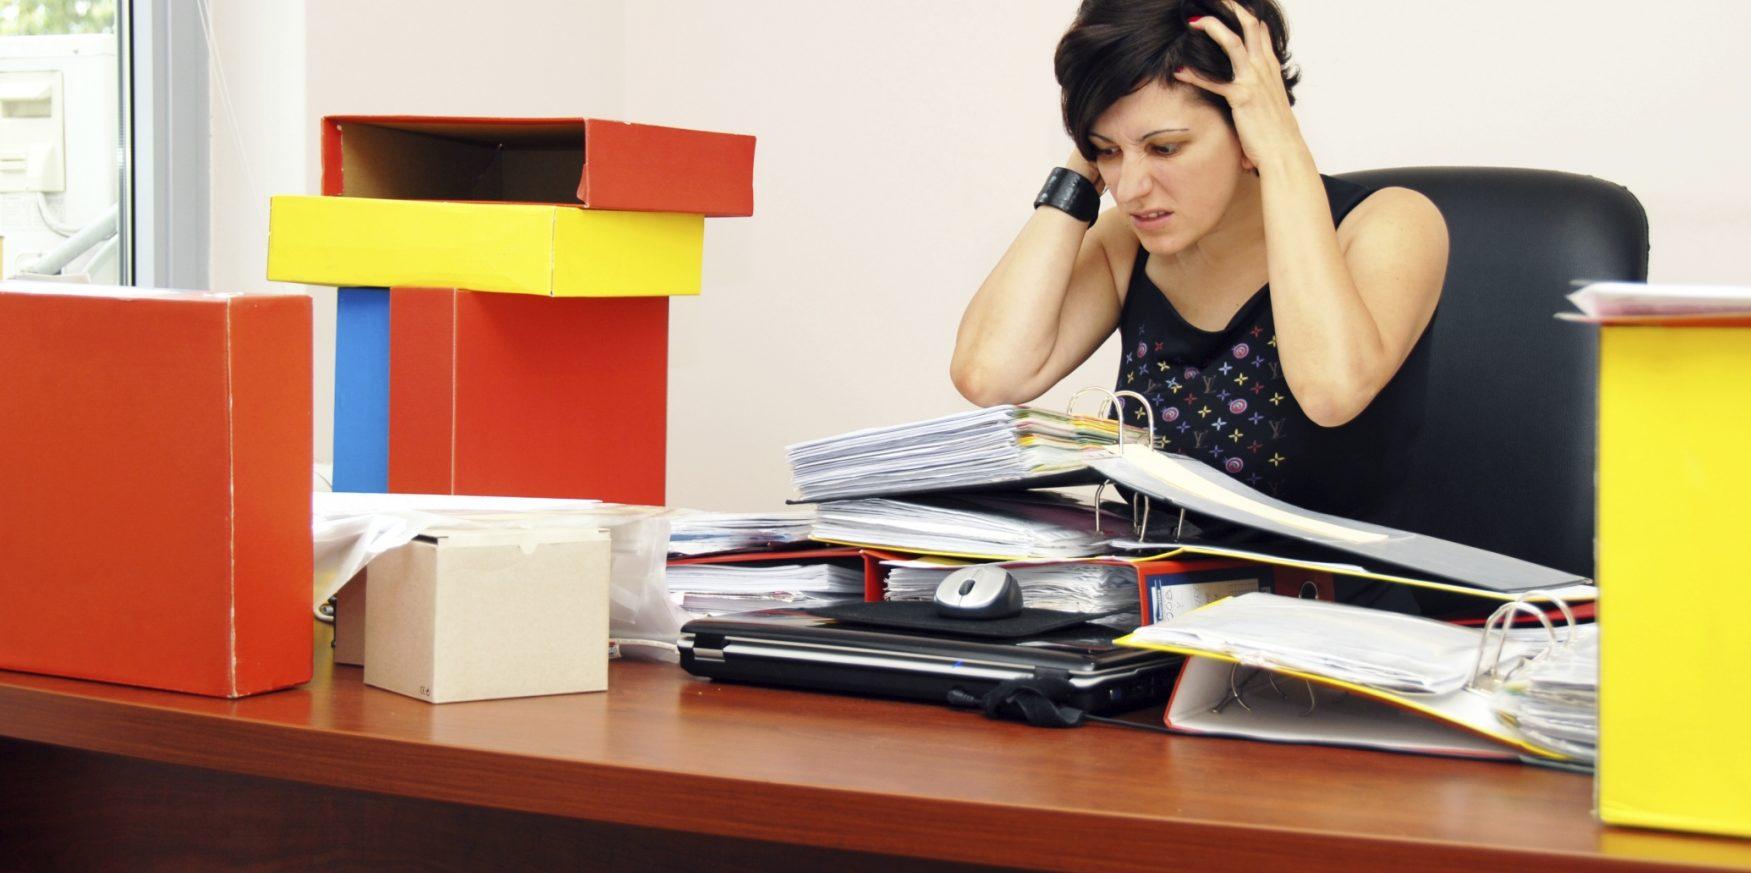 Estrés oficina – Voz Abierta